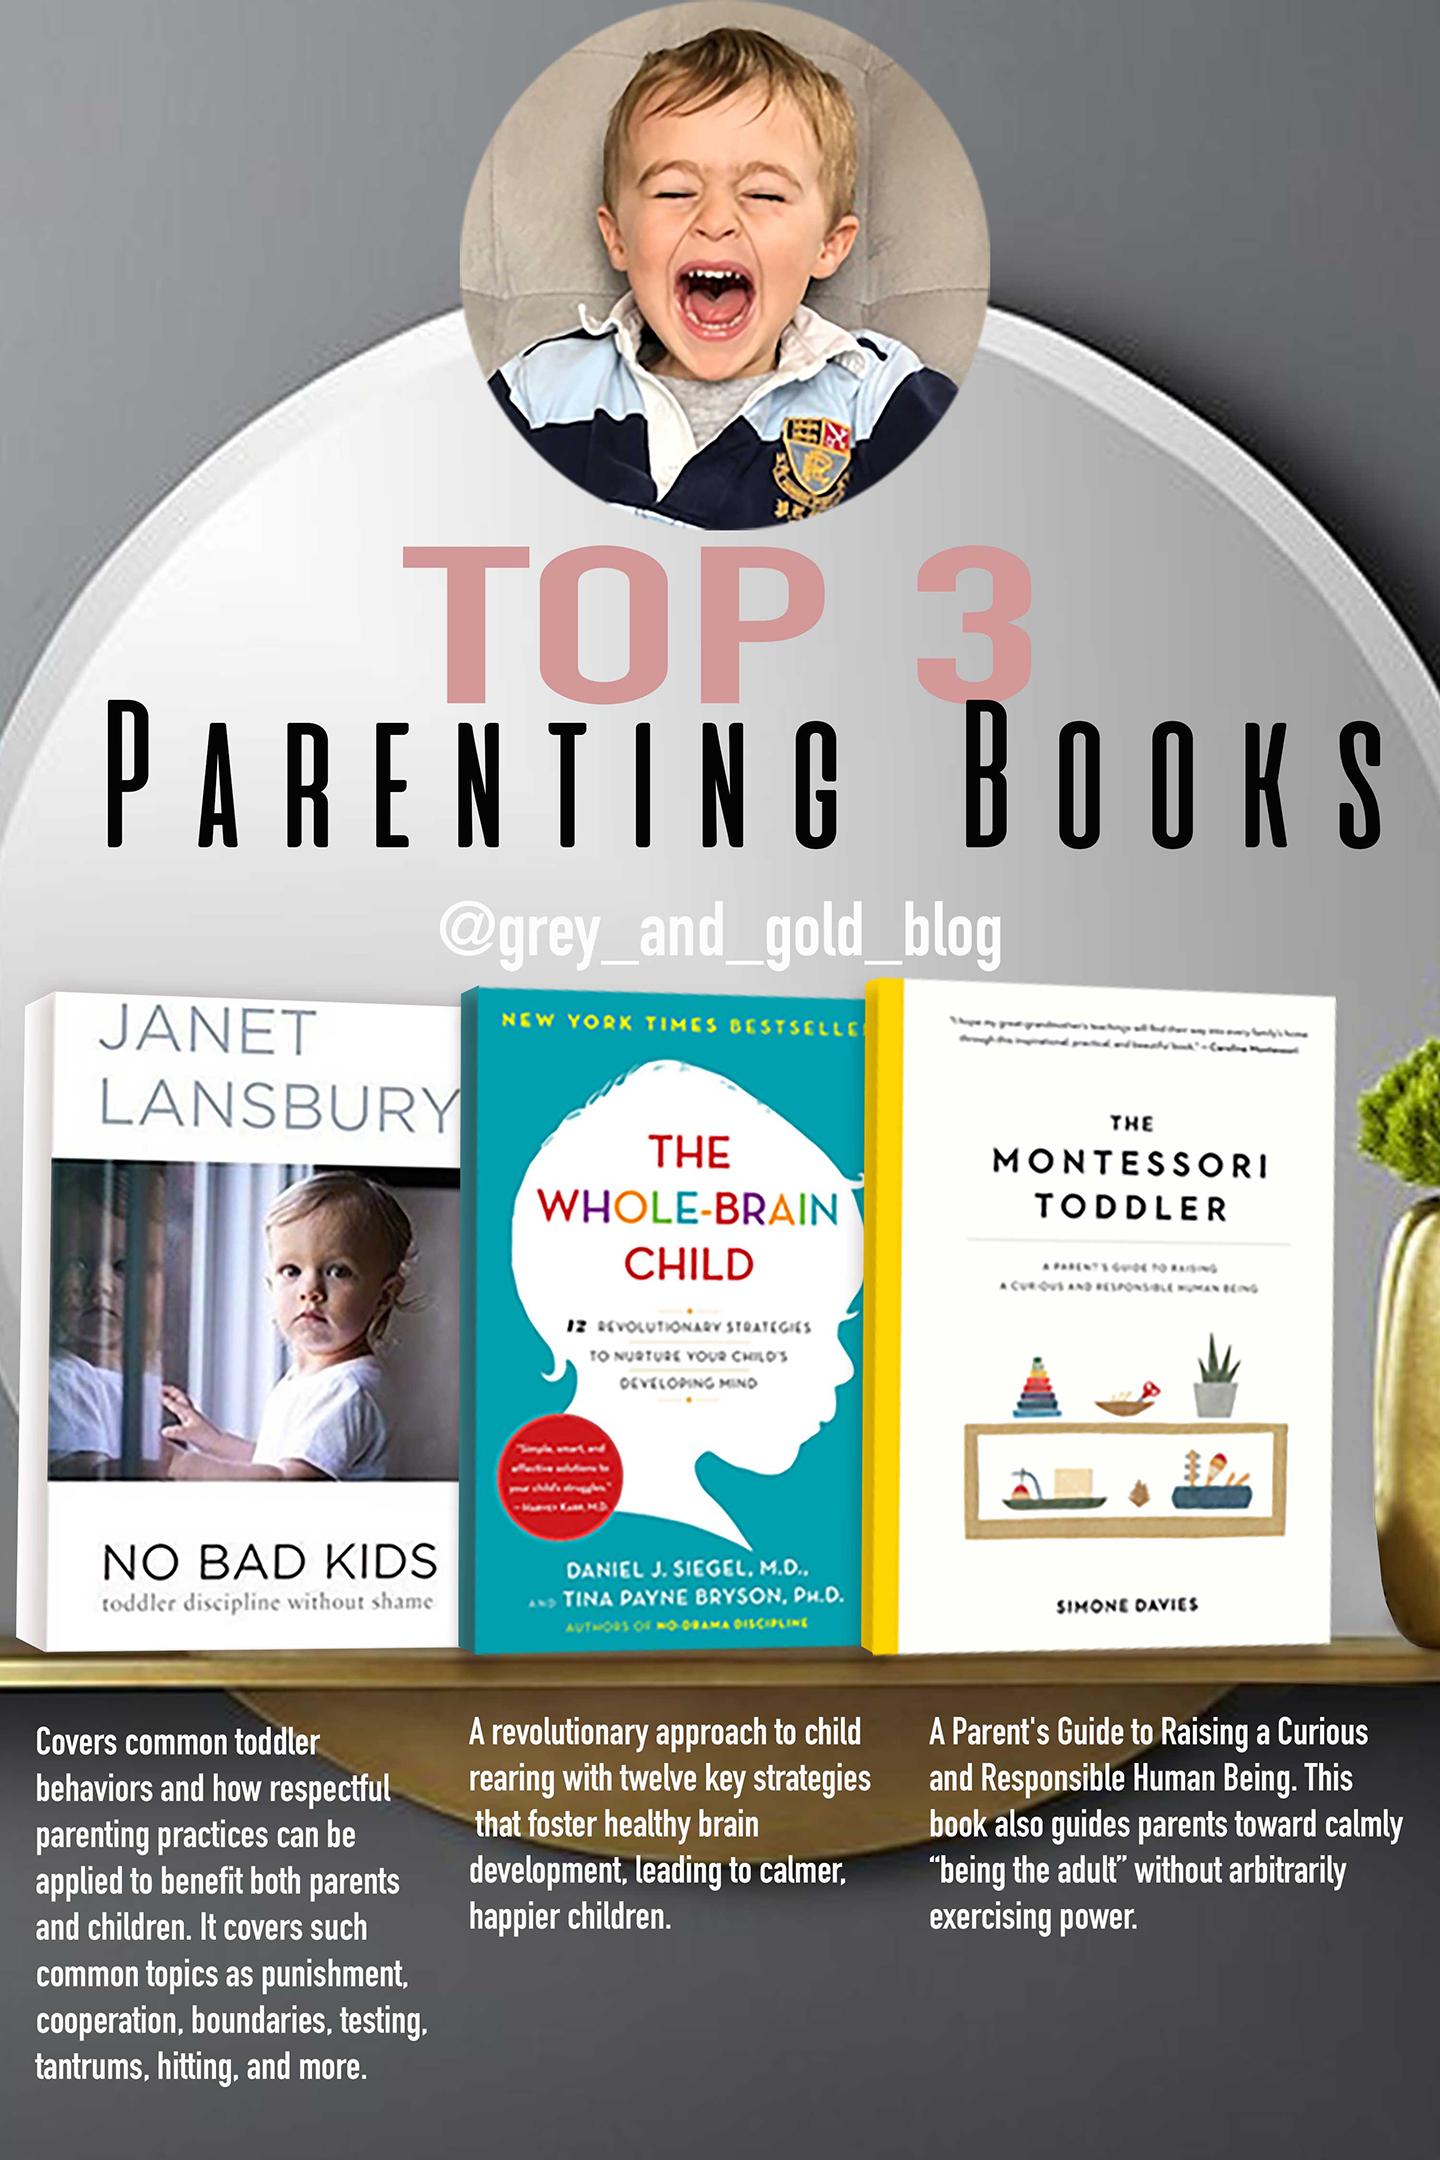 Top-3-parenting-books-Pinterest2